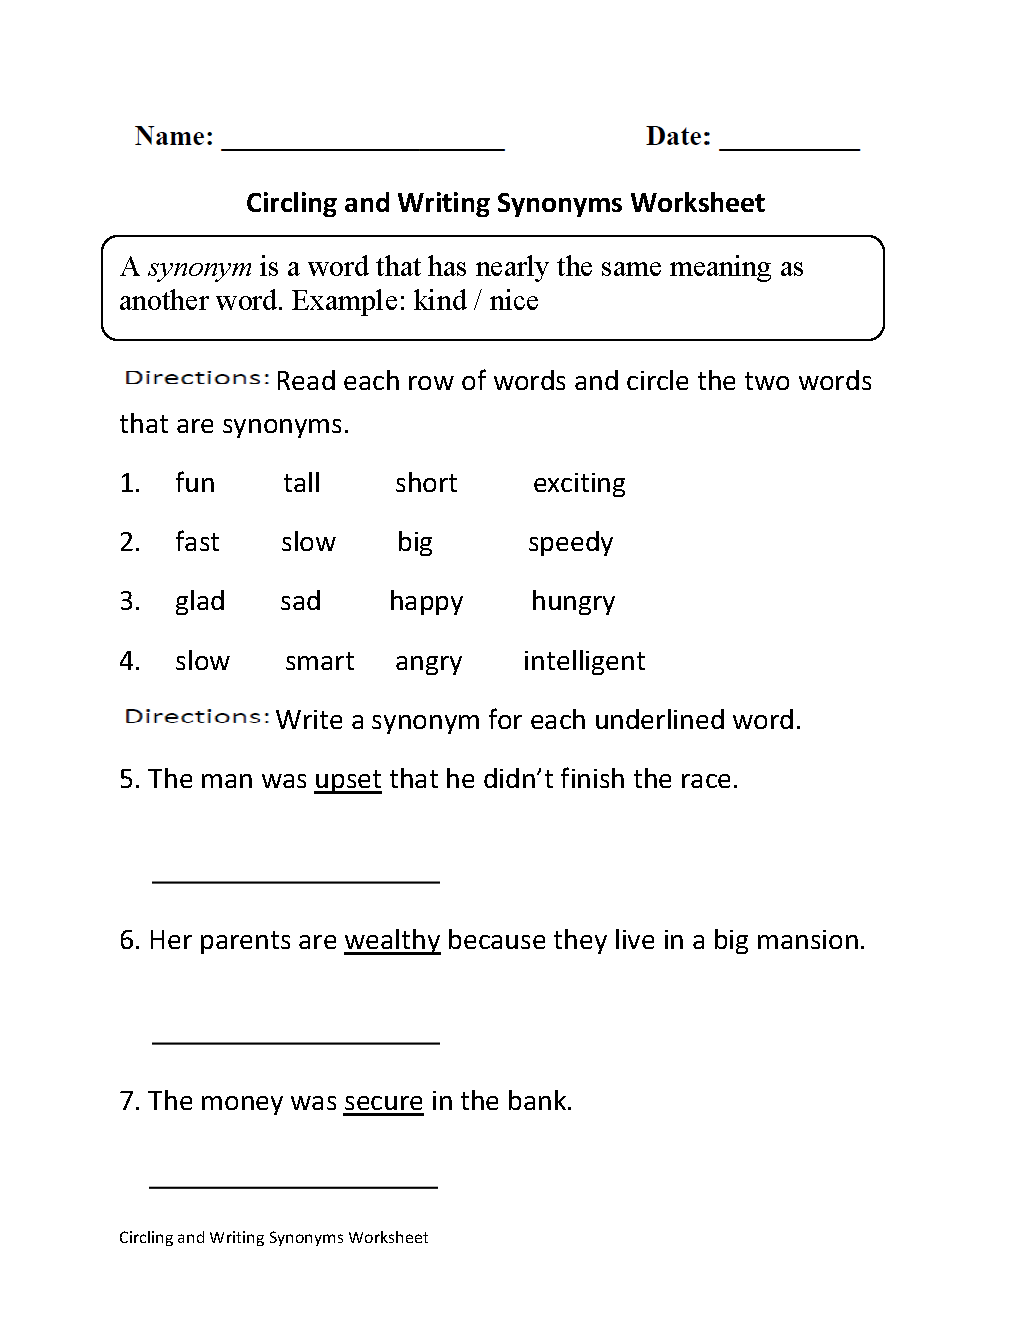 Circling And Writing Synonyms Worksheet Part 1 Beginner